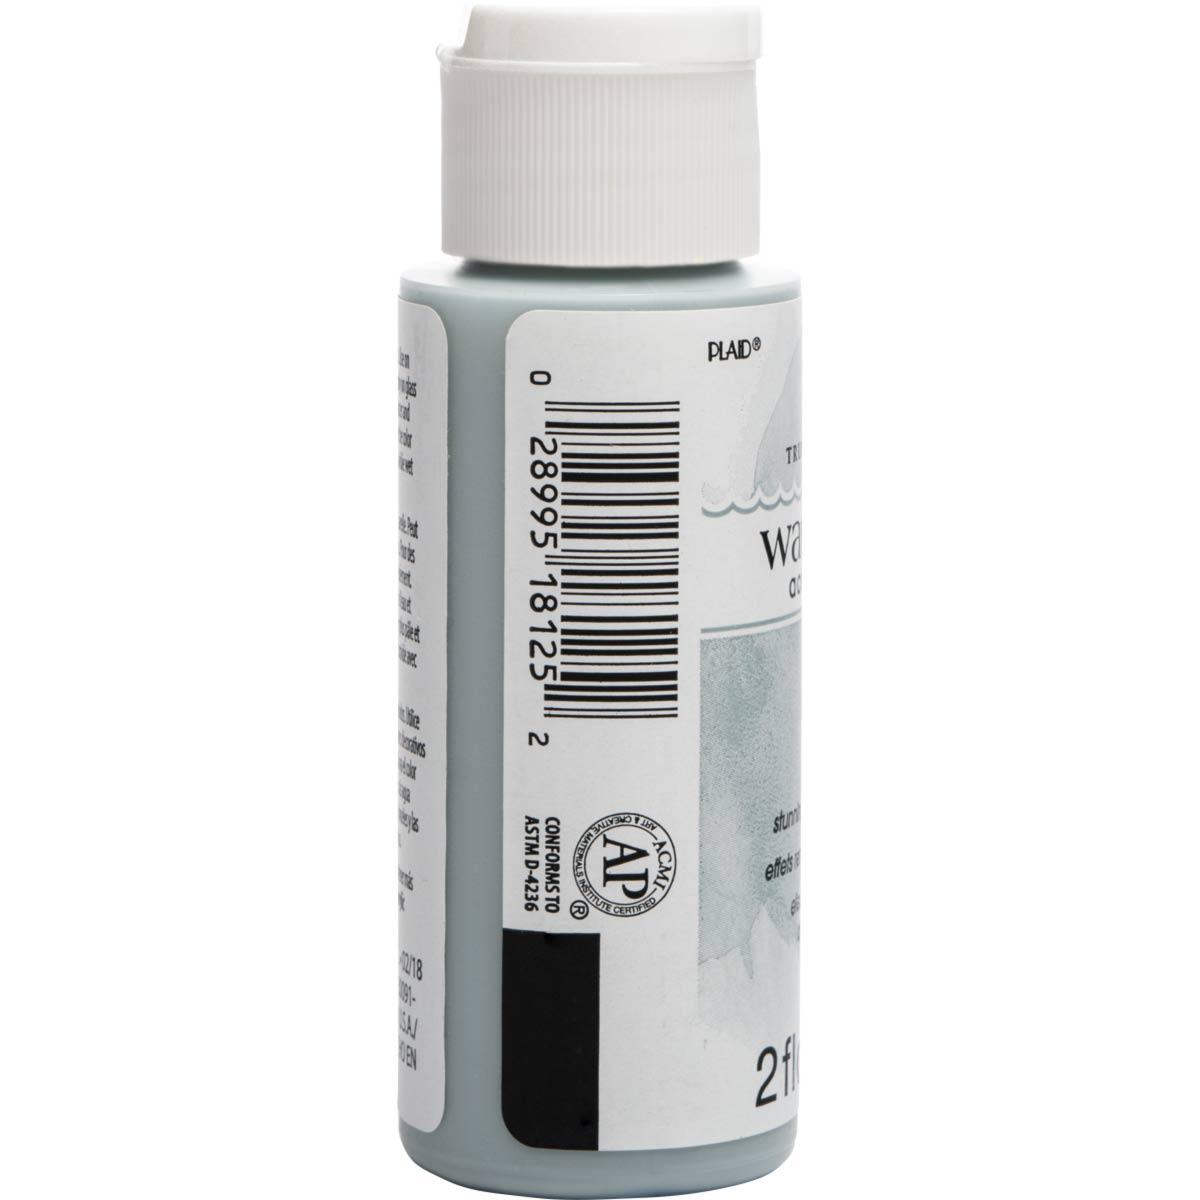 FolkArt ® Watercolor Acrylic Paint™ - Gray, 2 oz.